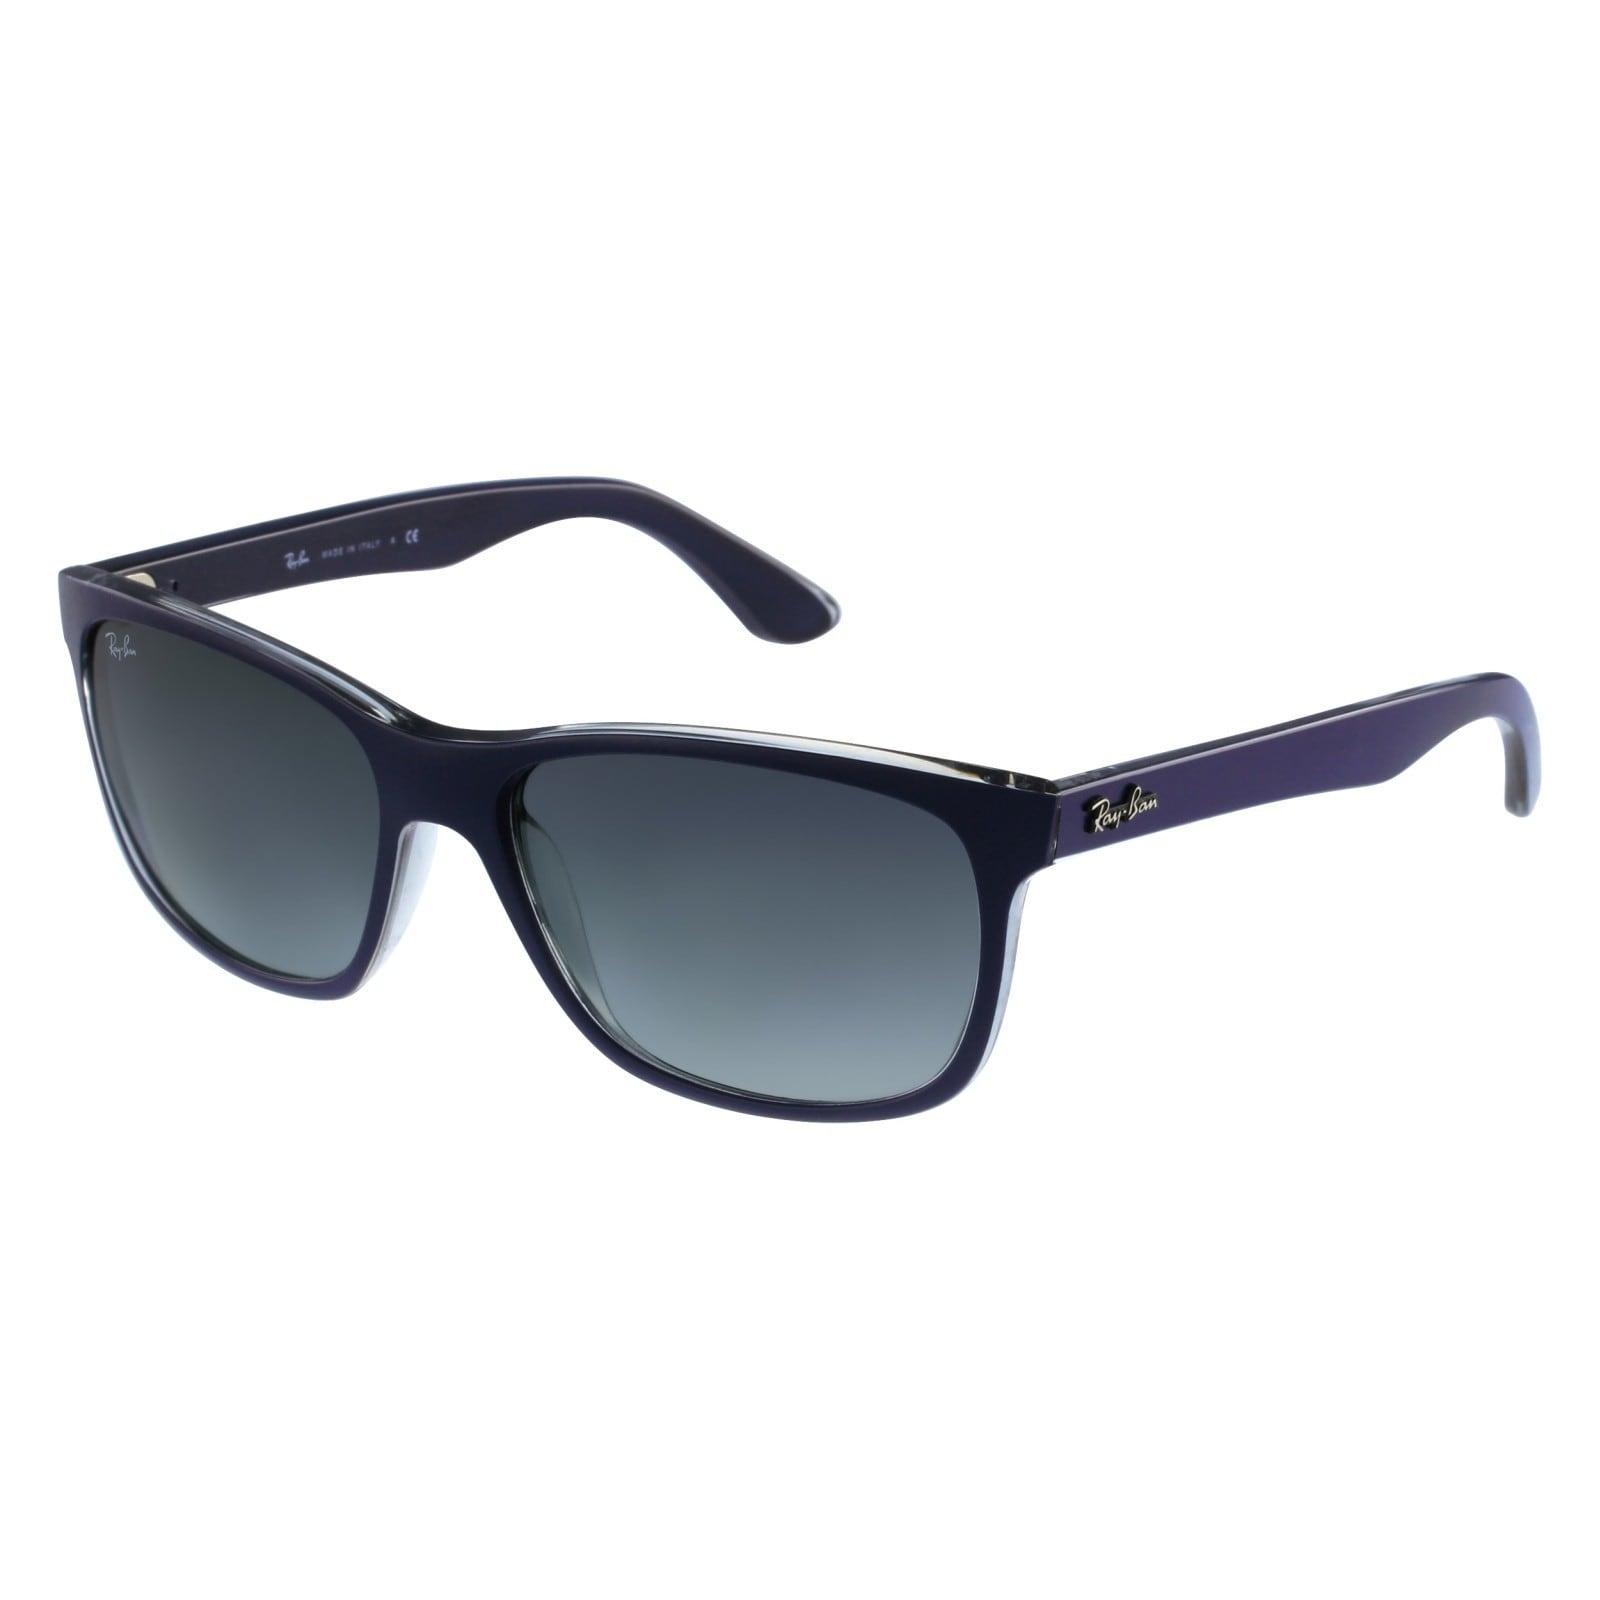 3bc631973a Shop Ray-Ban RB4181 Blue Grey Square Wayfarer Sunglasses - Free ...